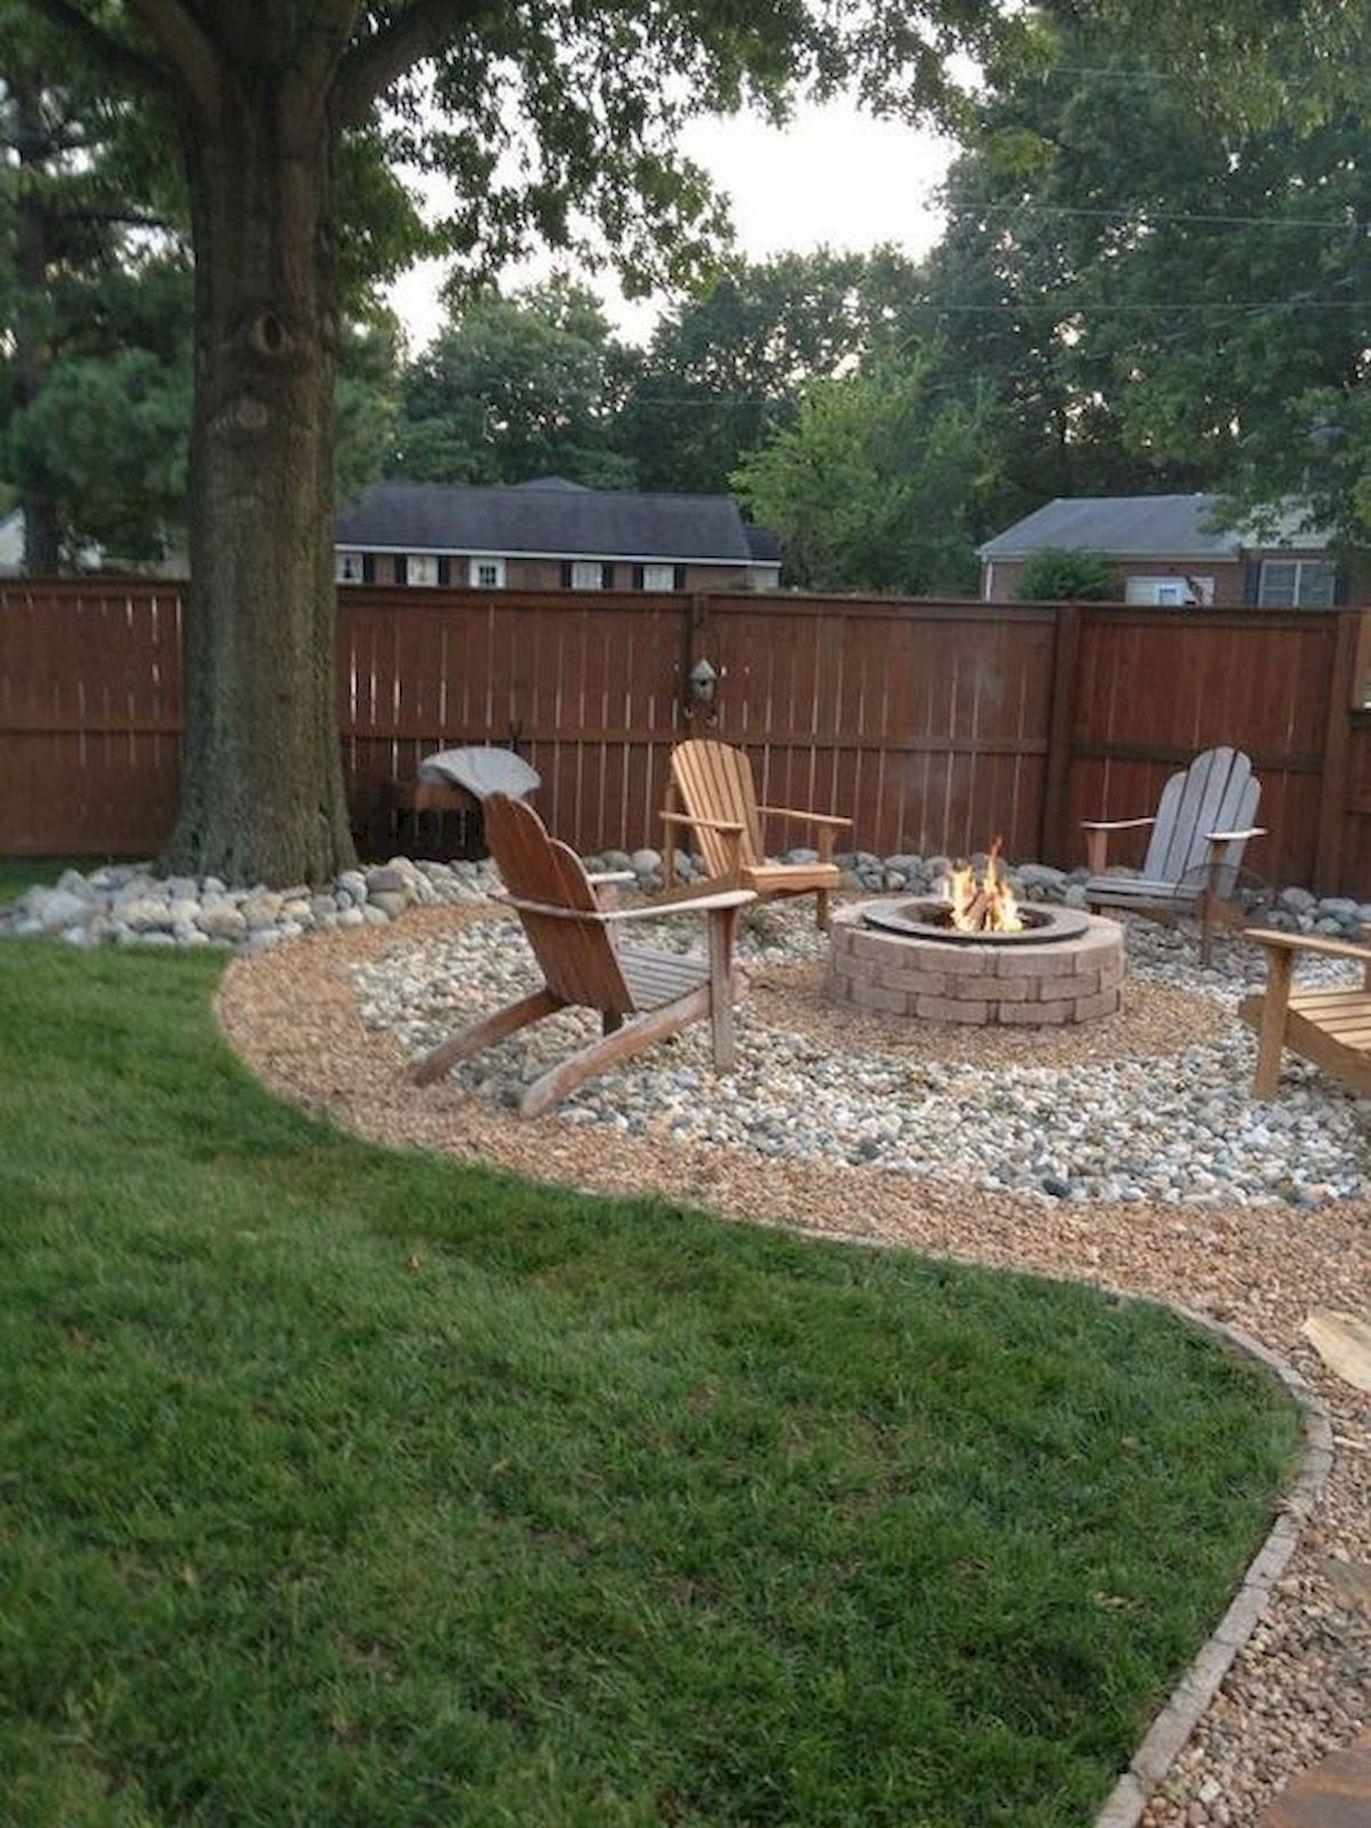 24 Backyard Fire Pit Ideas Landscaping - Create a Relaxing ...